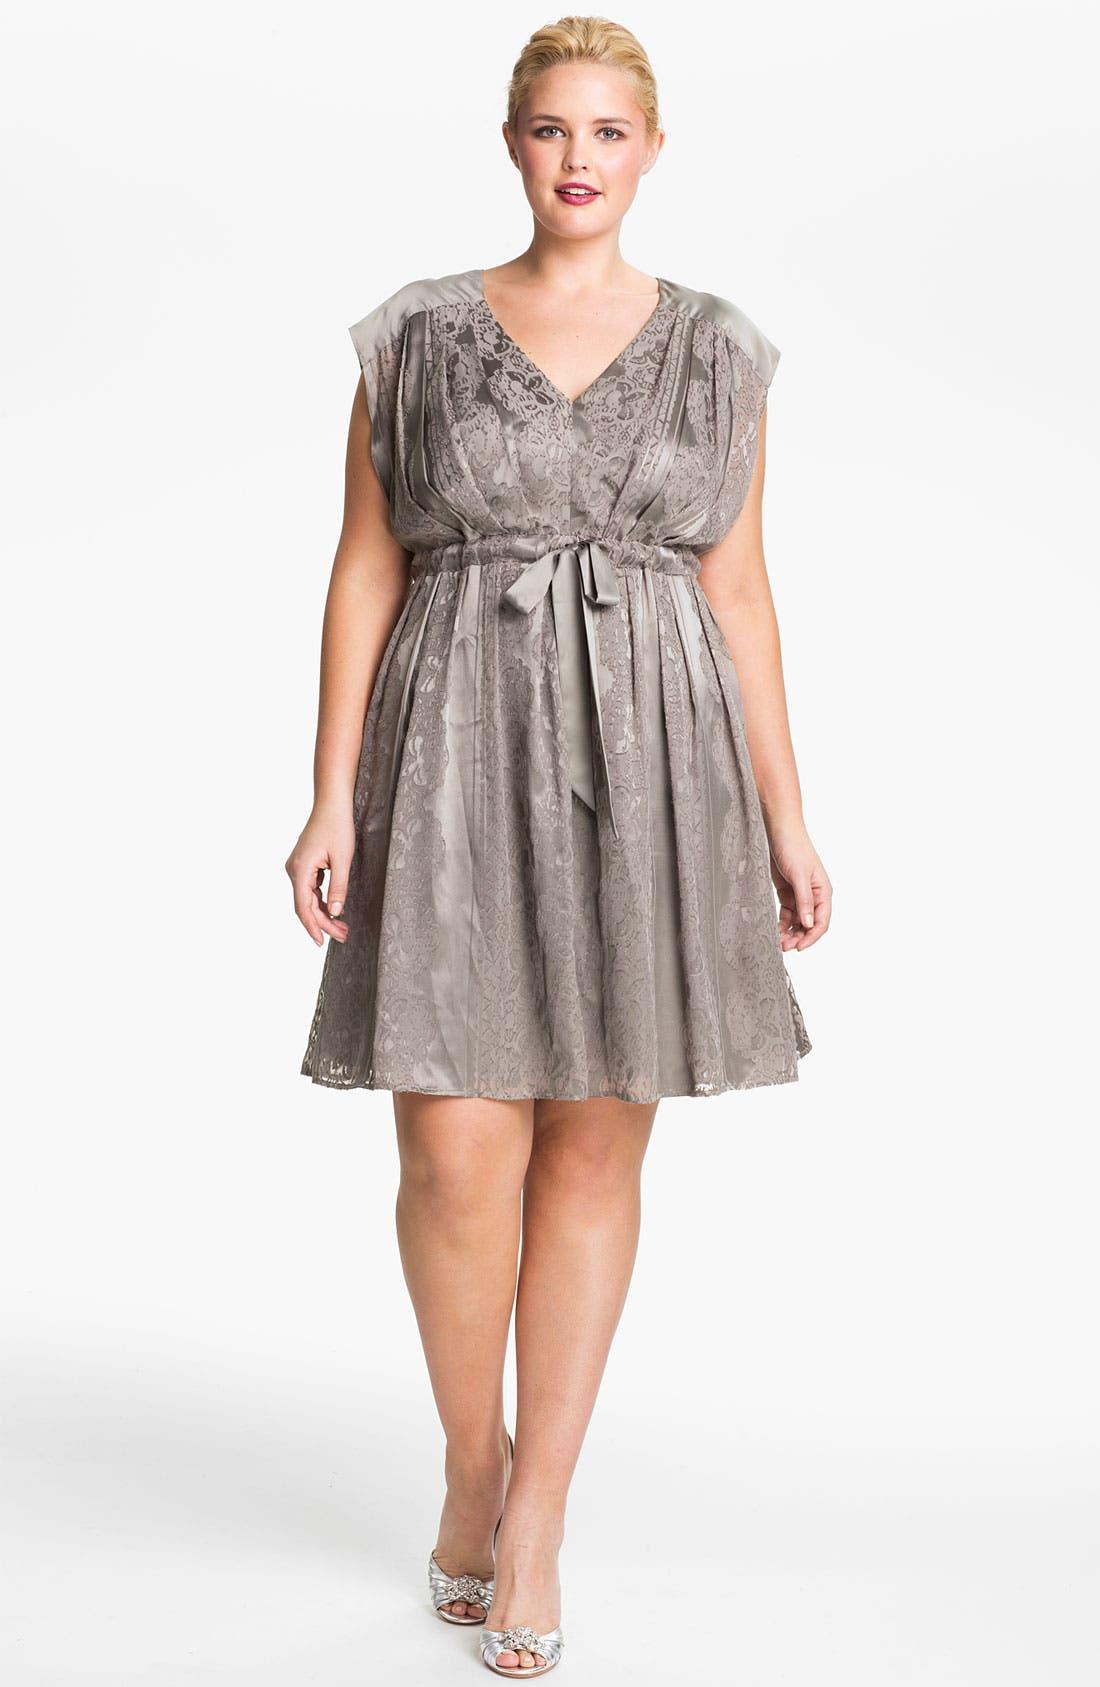 Alternate Image 1 Selected - Jessica Simpson Lace Print Satin Dress (Plus)